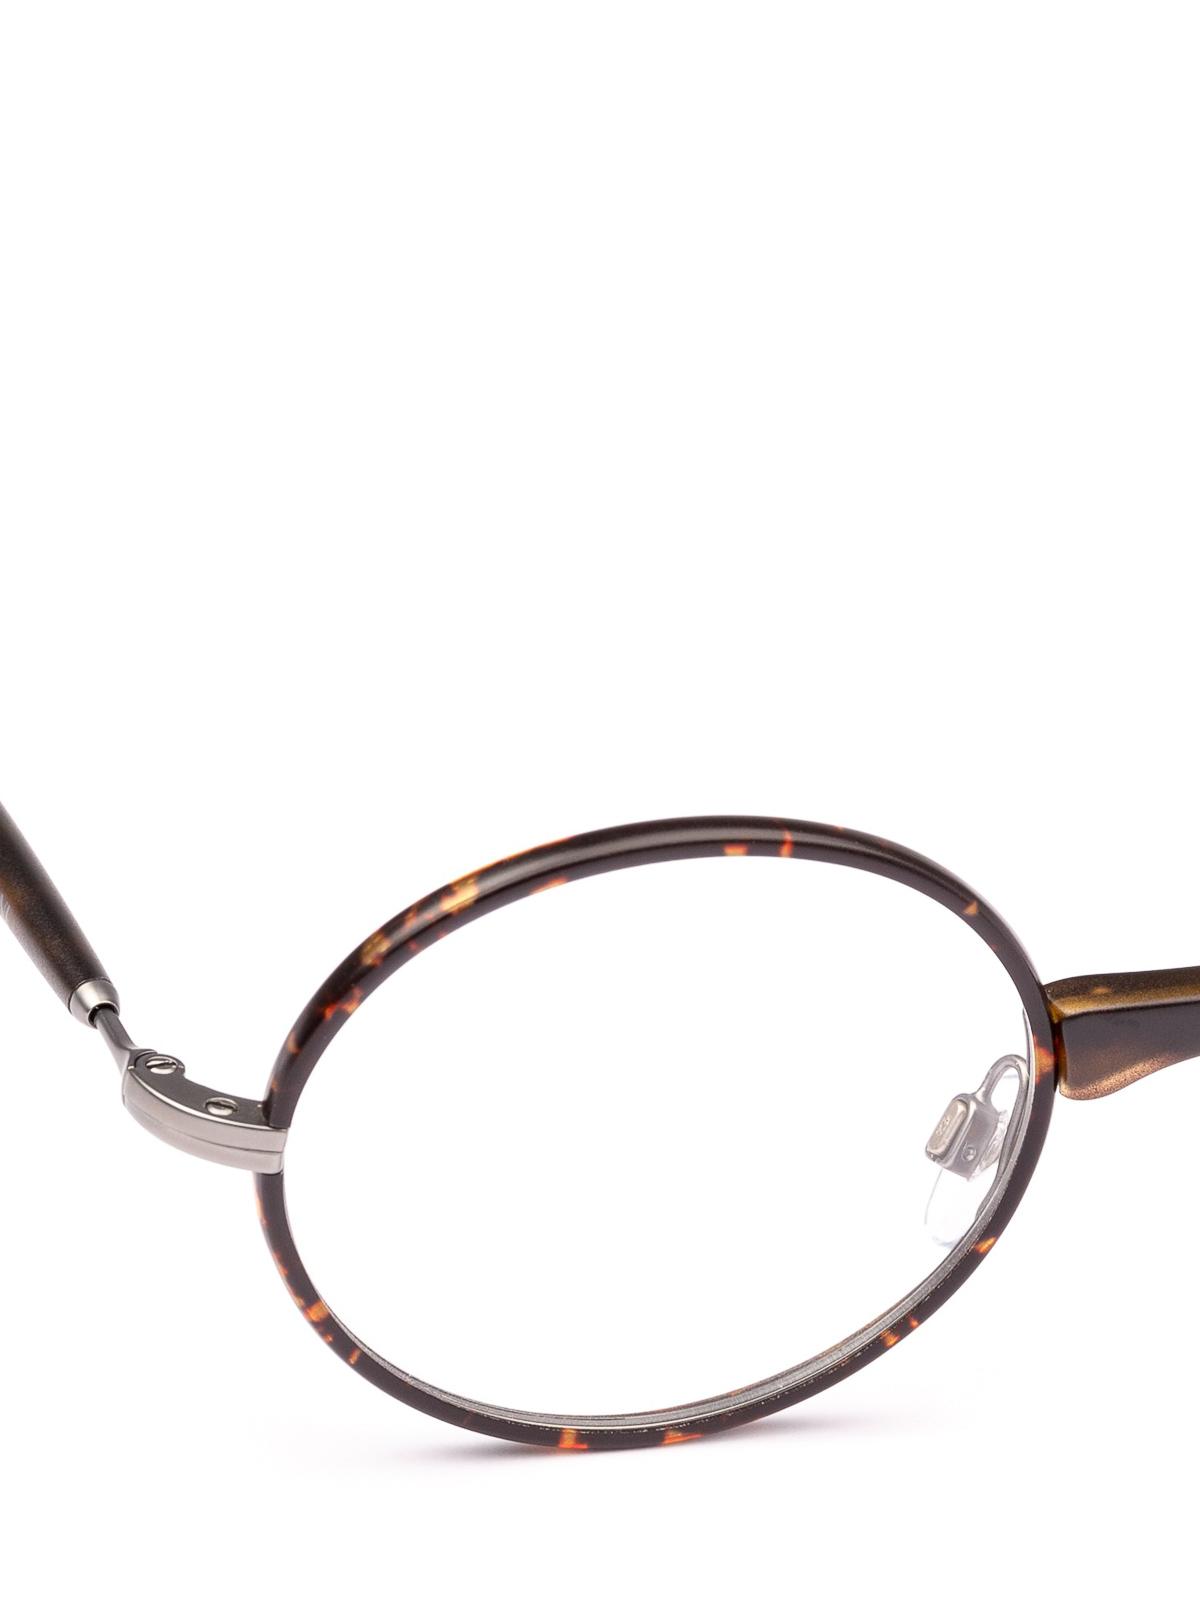 22f93d0b8842 iKRIX GIORGIO ARMANI: Glasses - Havana slender frame oval eyeglasses